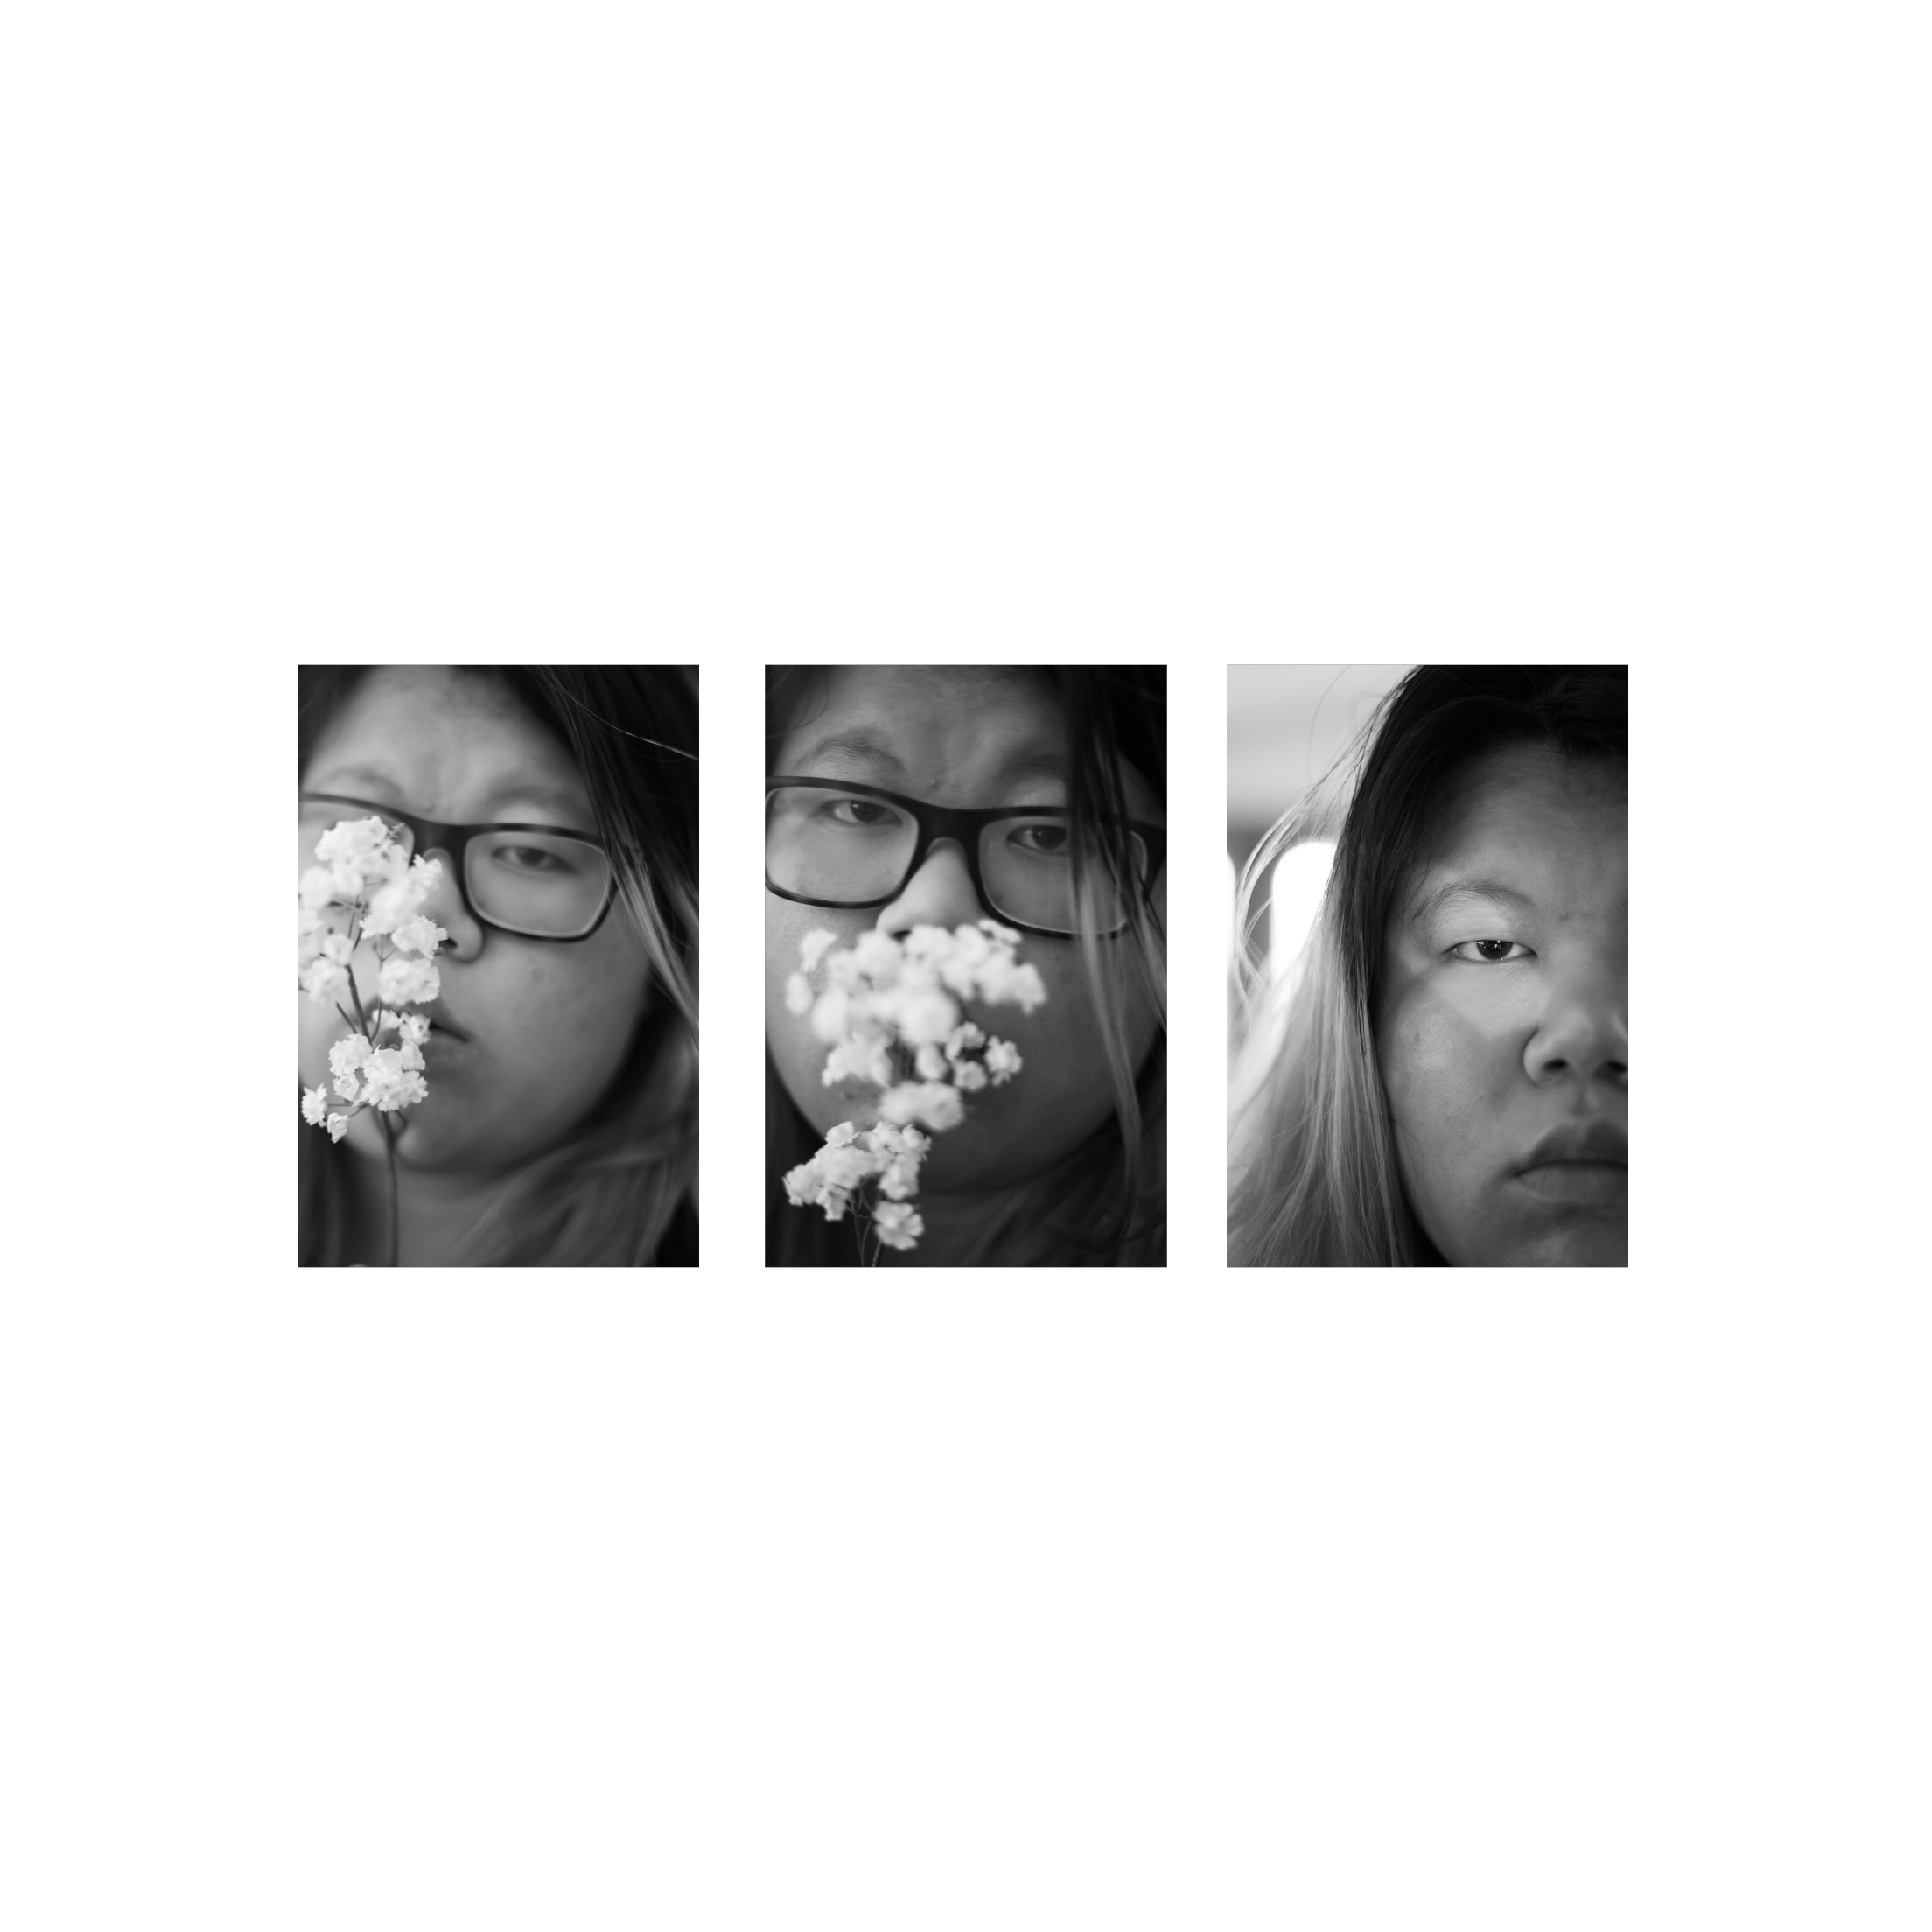 Self- Portrait Series,  2018